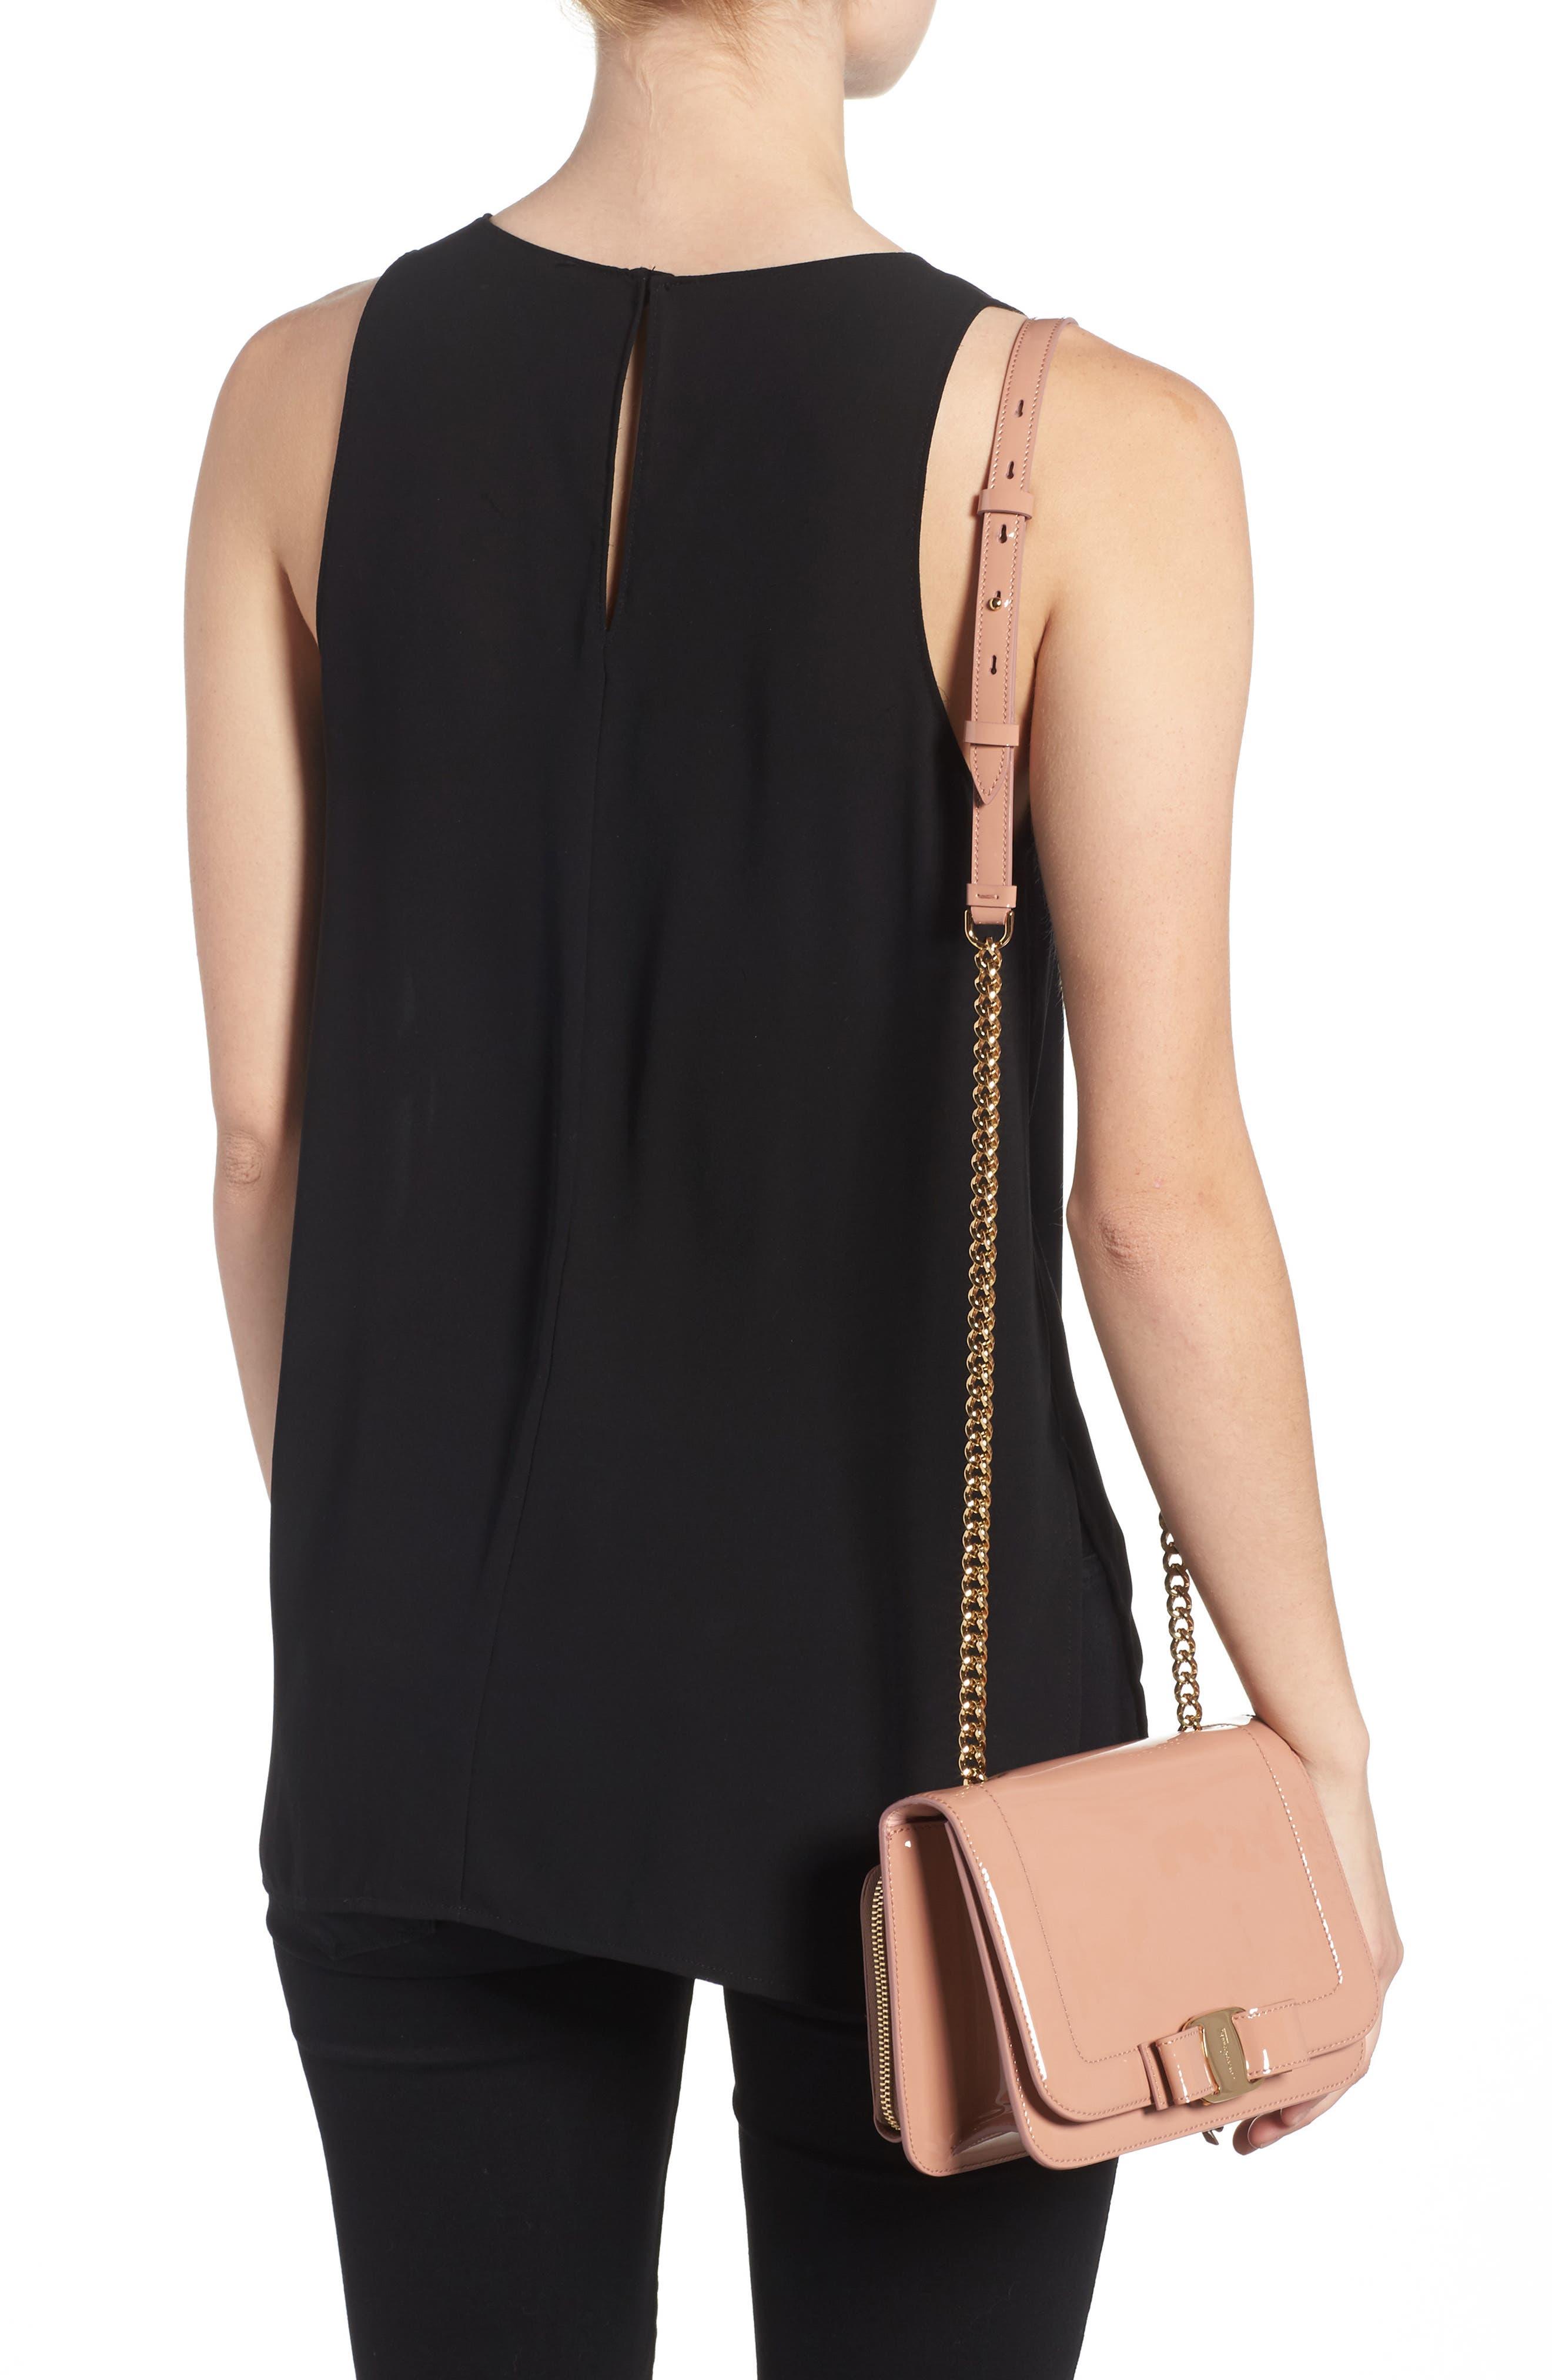 Vara Patent Leather Shoulder Bag,                             Alternate thumbnail 2, color,                             NEW BLUSH/ BONBON